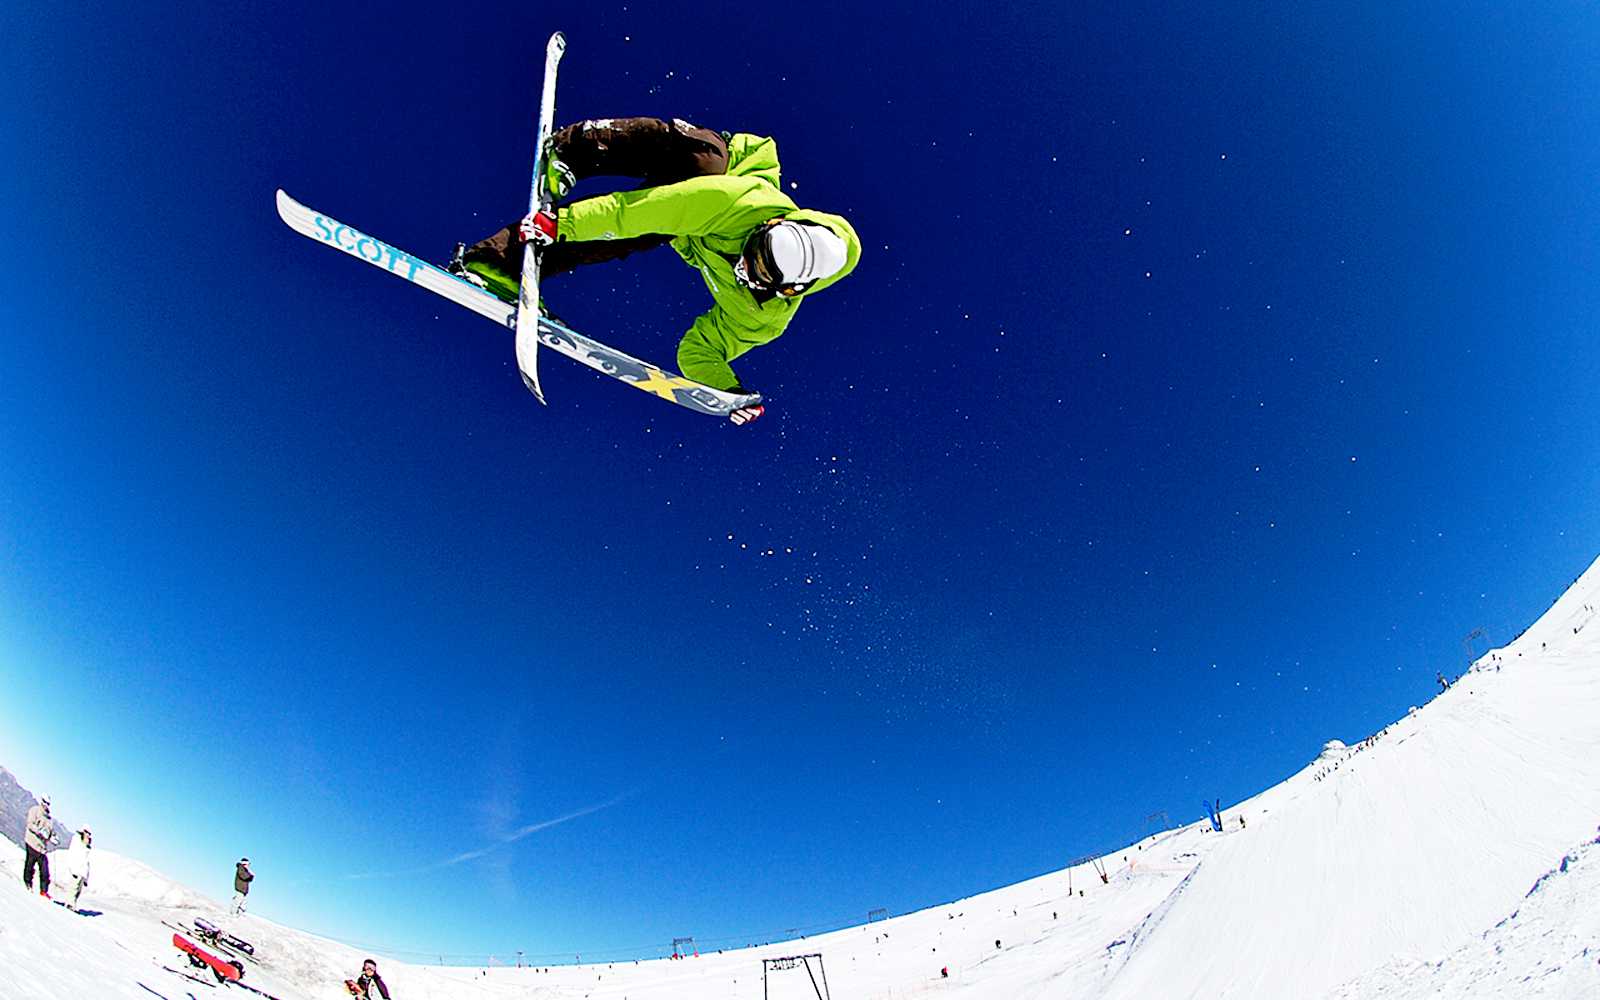 All Sport Wallpaper Hd: Skiing Winter Sports HD Wallpapers